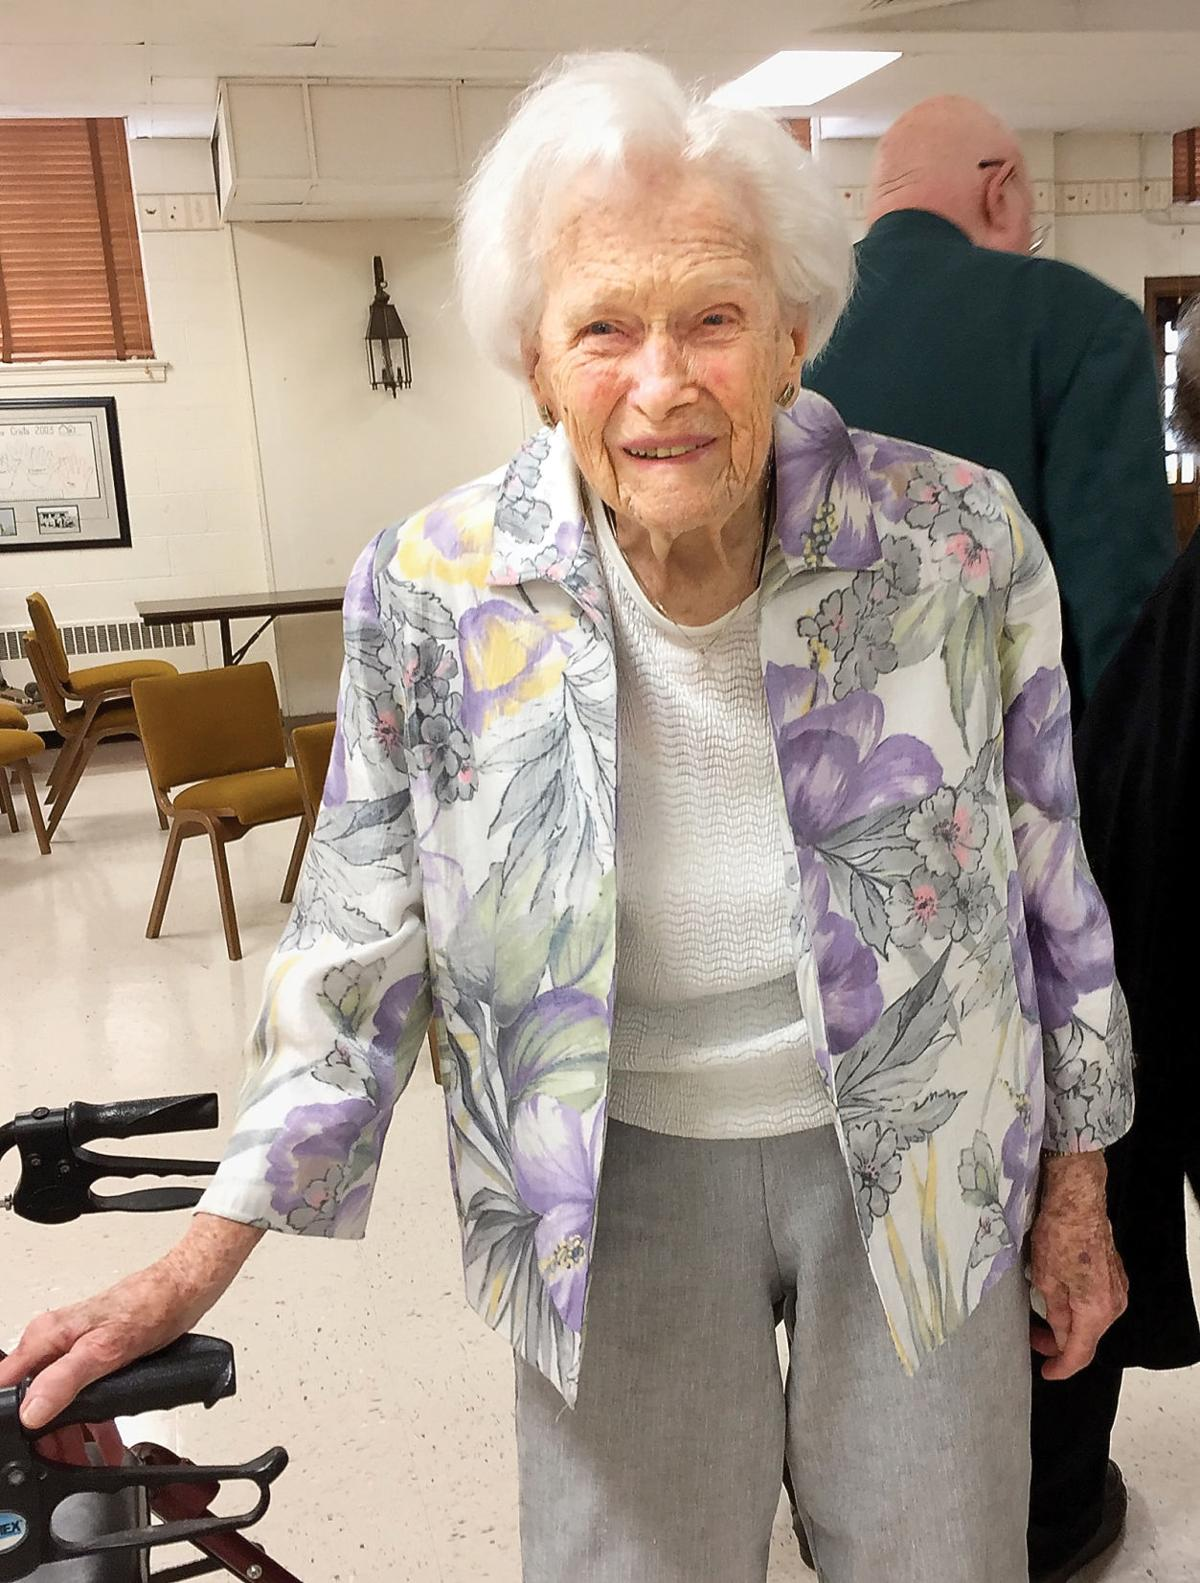 Lois Murphy will celebrate her 105th birthday